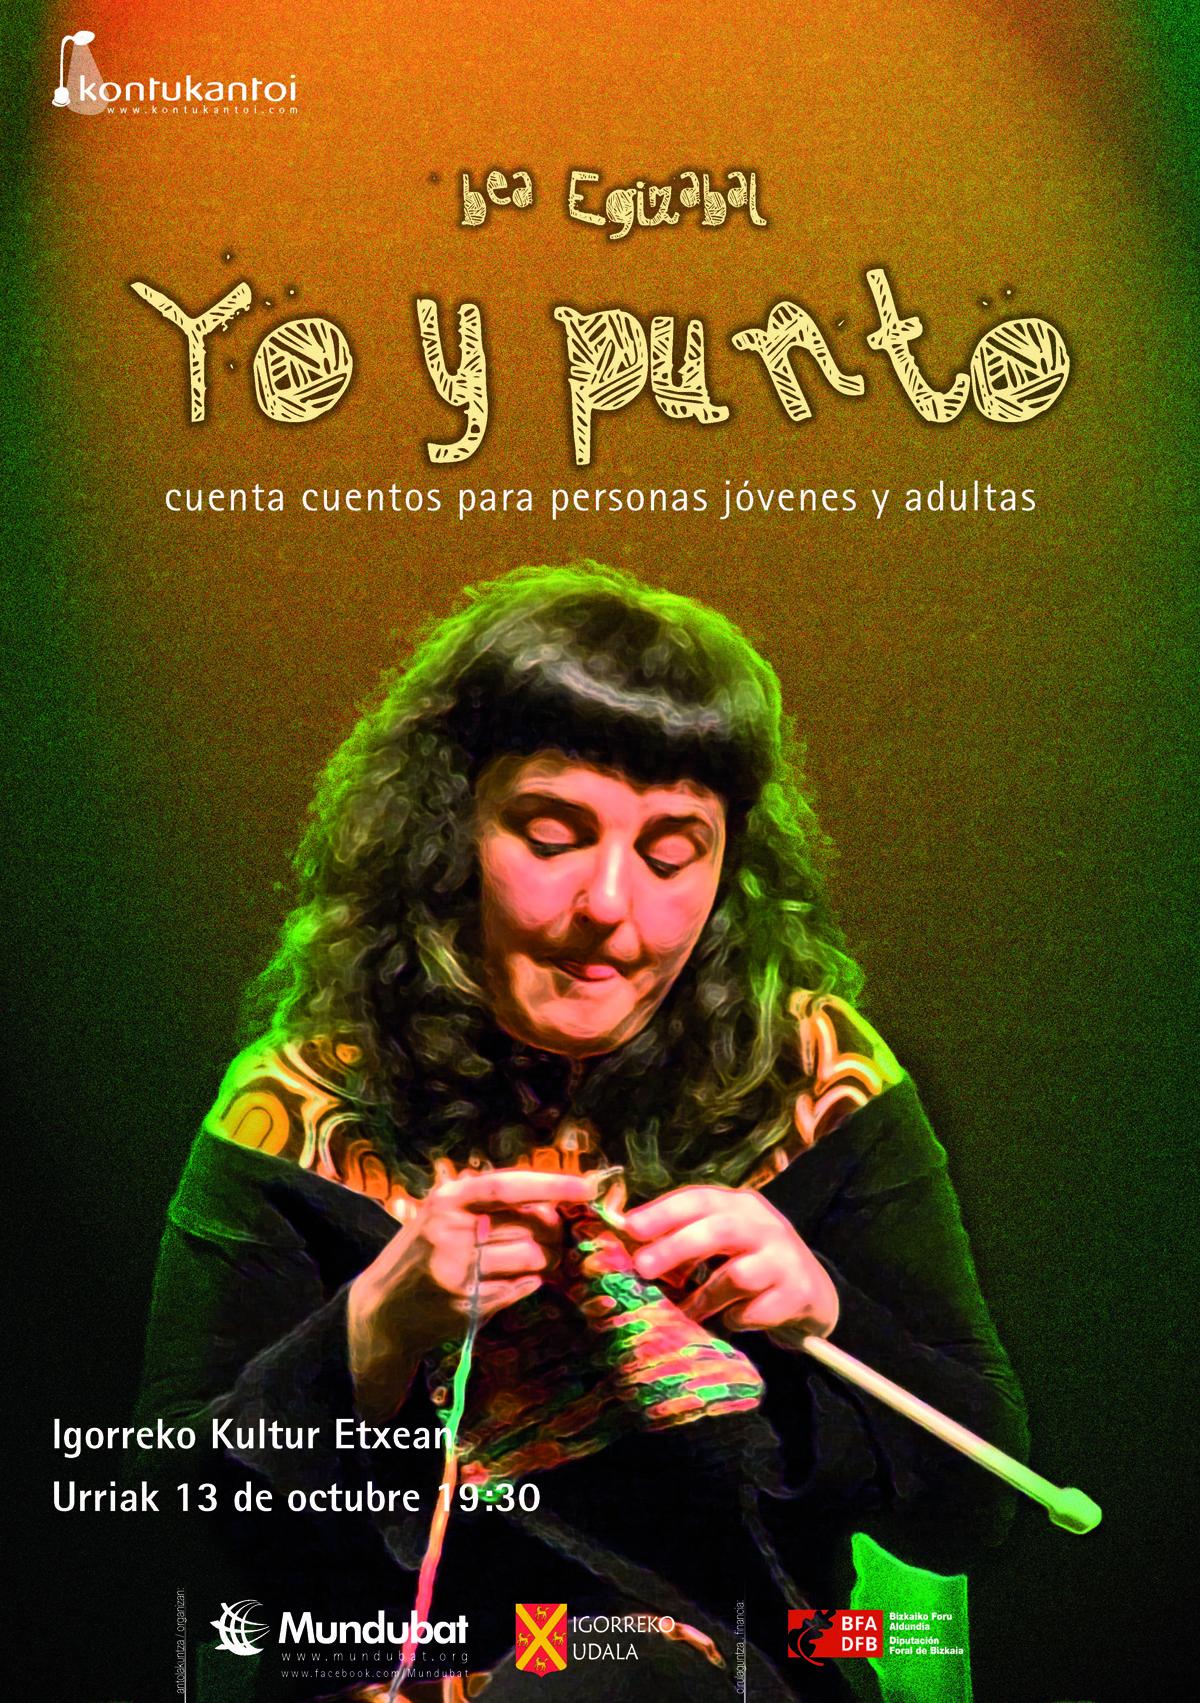 yoypuntoigorre